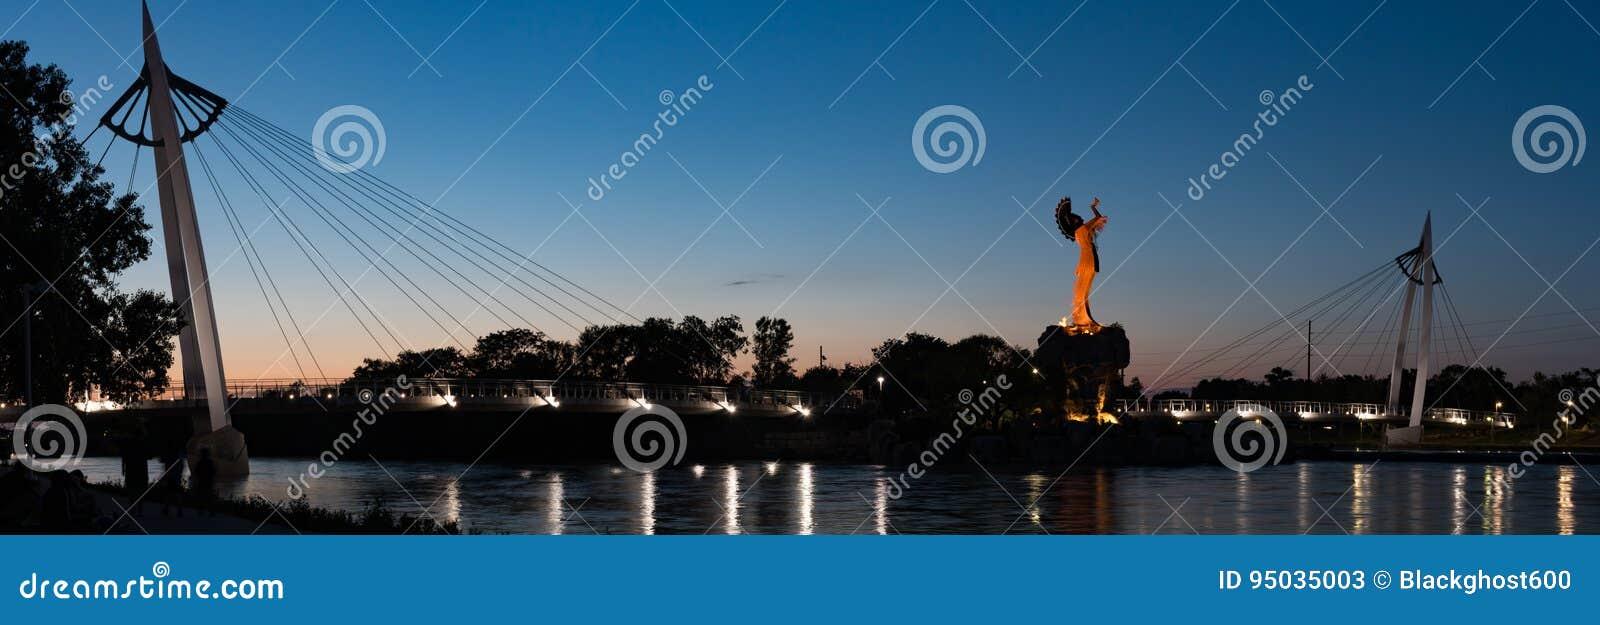 Keeper of the plains at night in Wichita Kansas